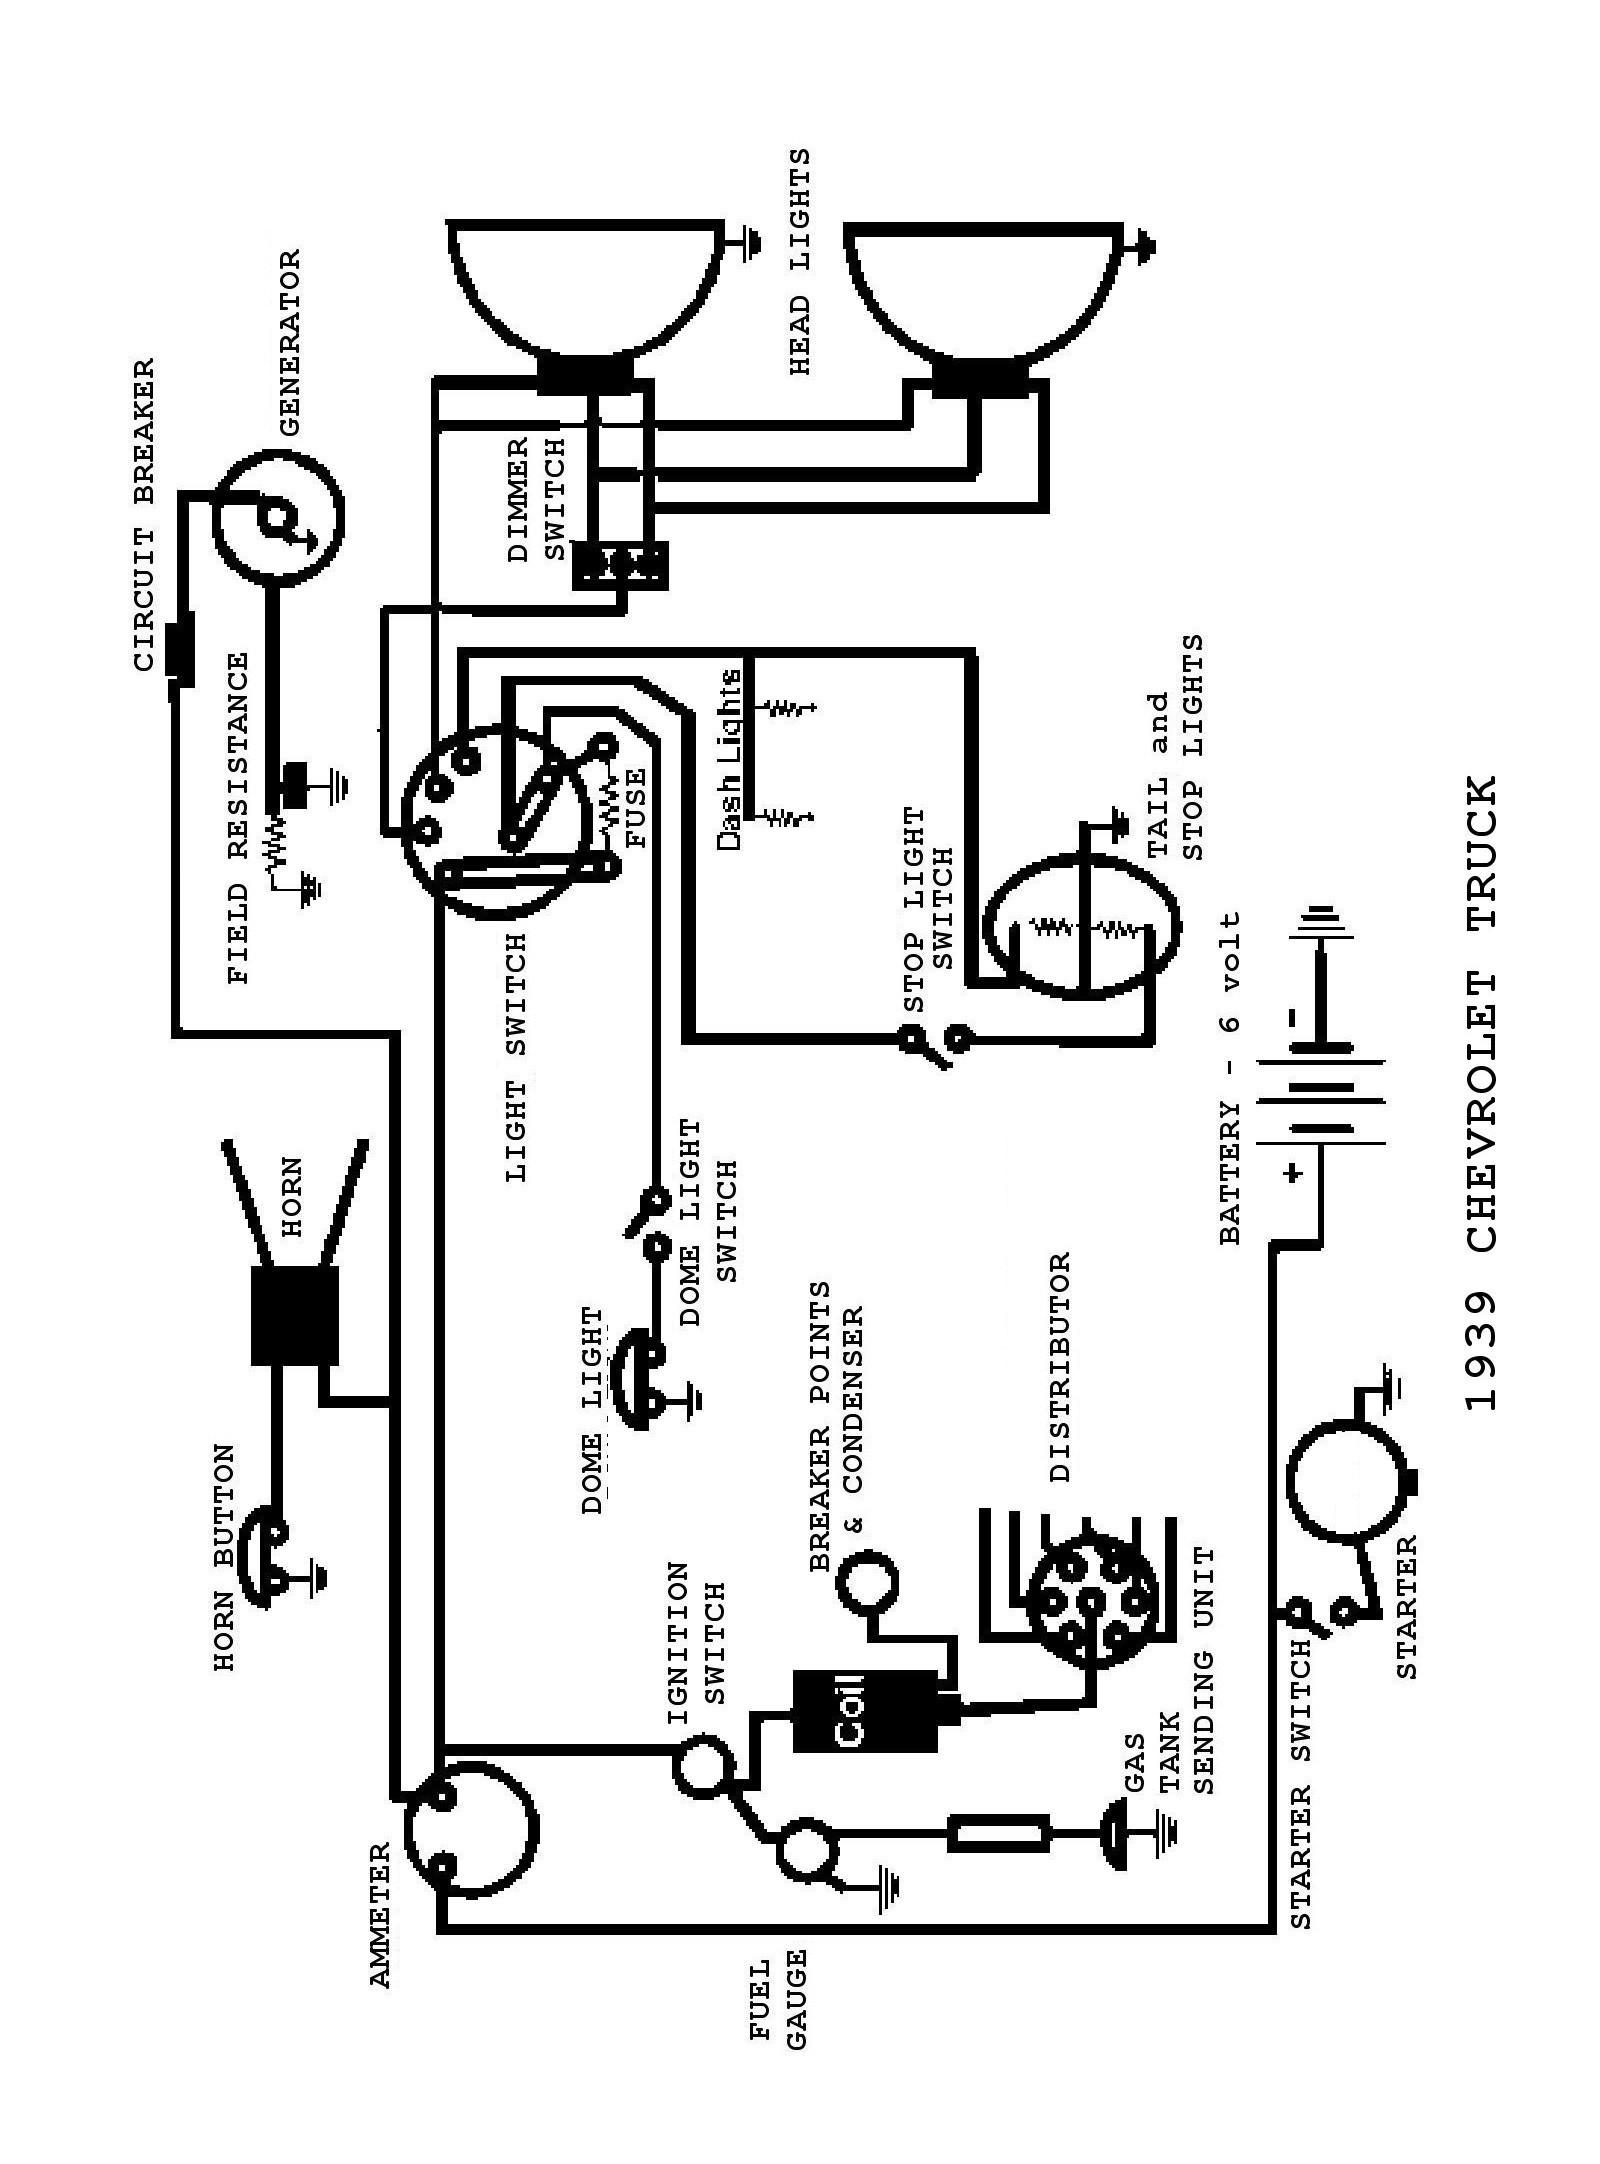 International Truck Wiring Diagram Elegant Unique International 4700 Wiring Diagram Pdf Diagram